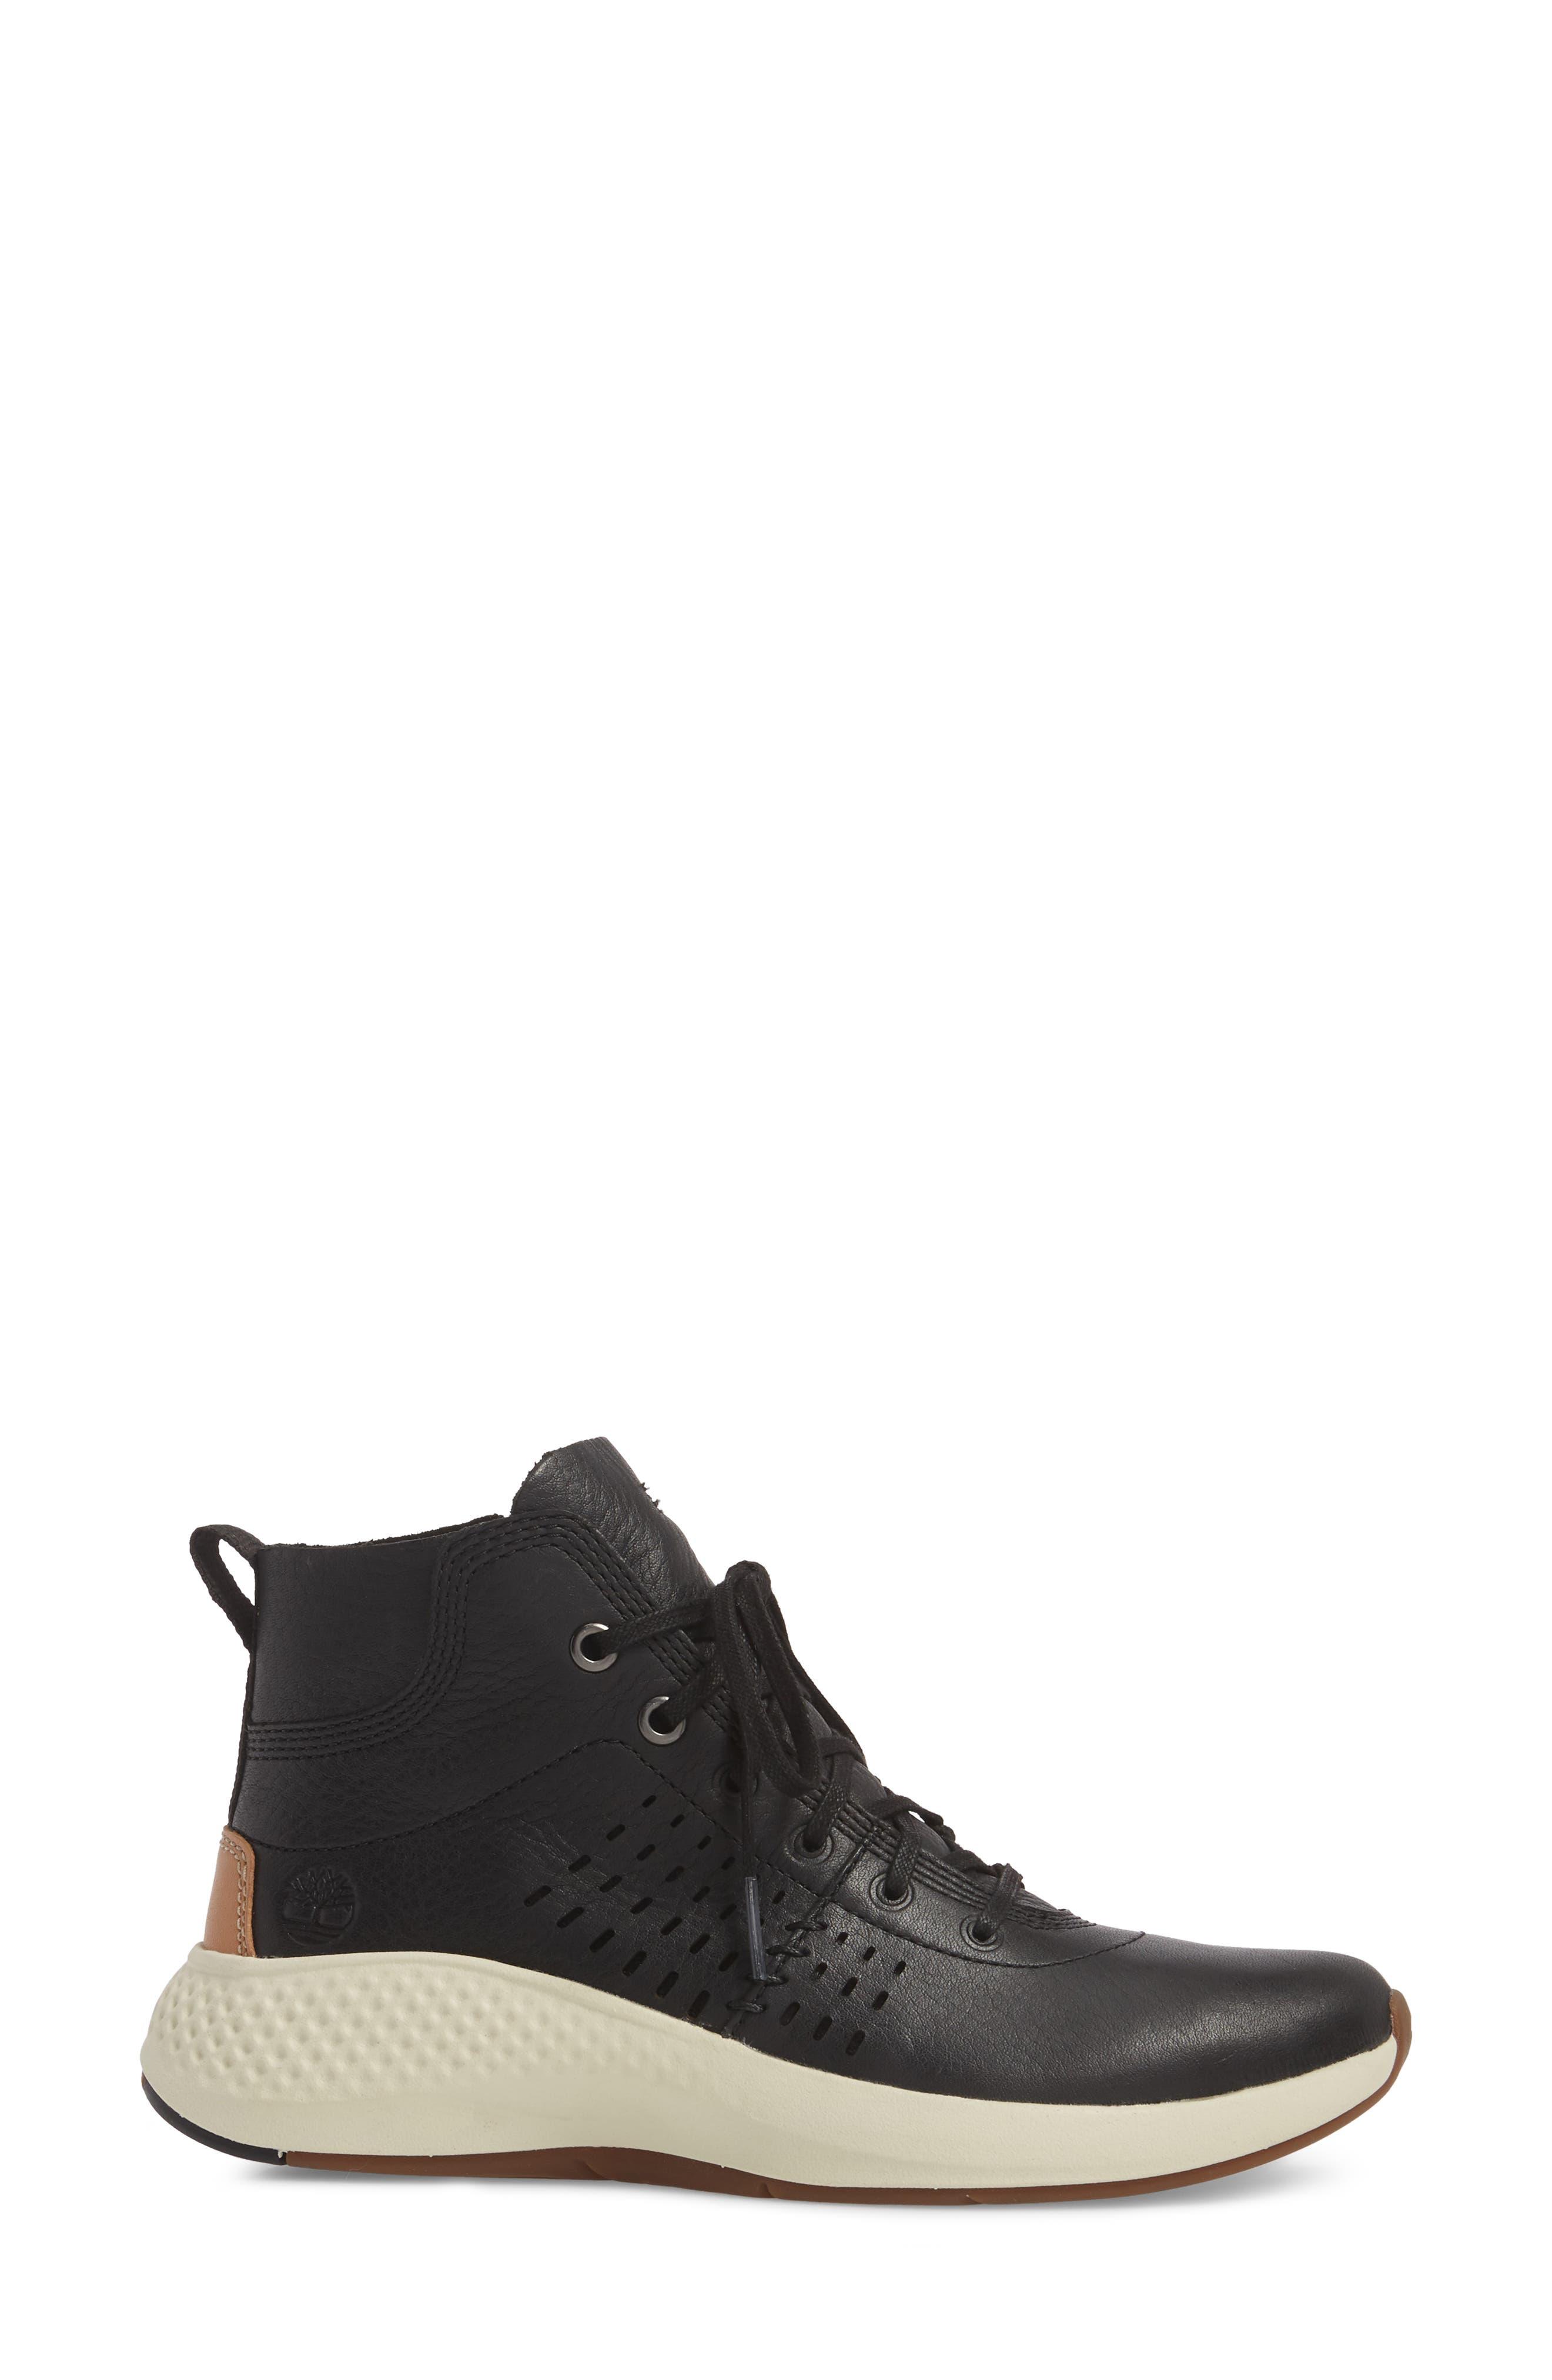 Flyroam Go Chukka Bootie,                             Alternate thumbnail 3, color,                             Black Leather